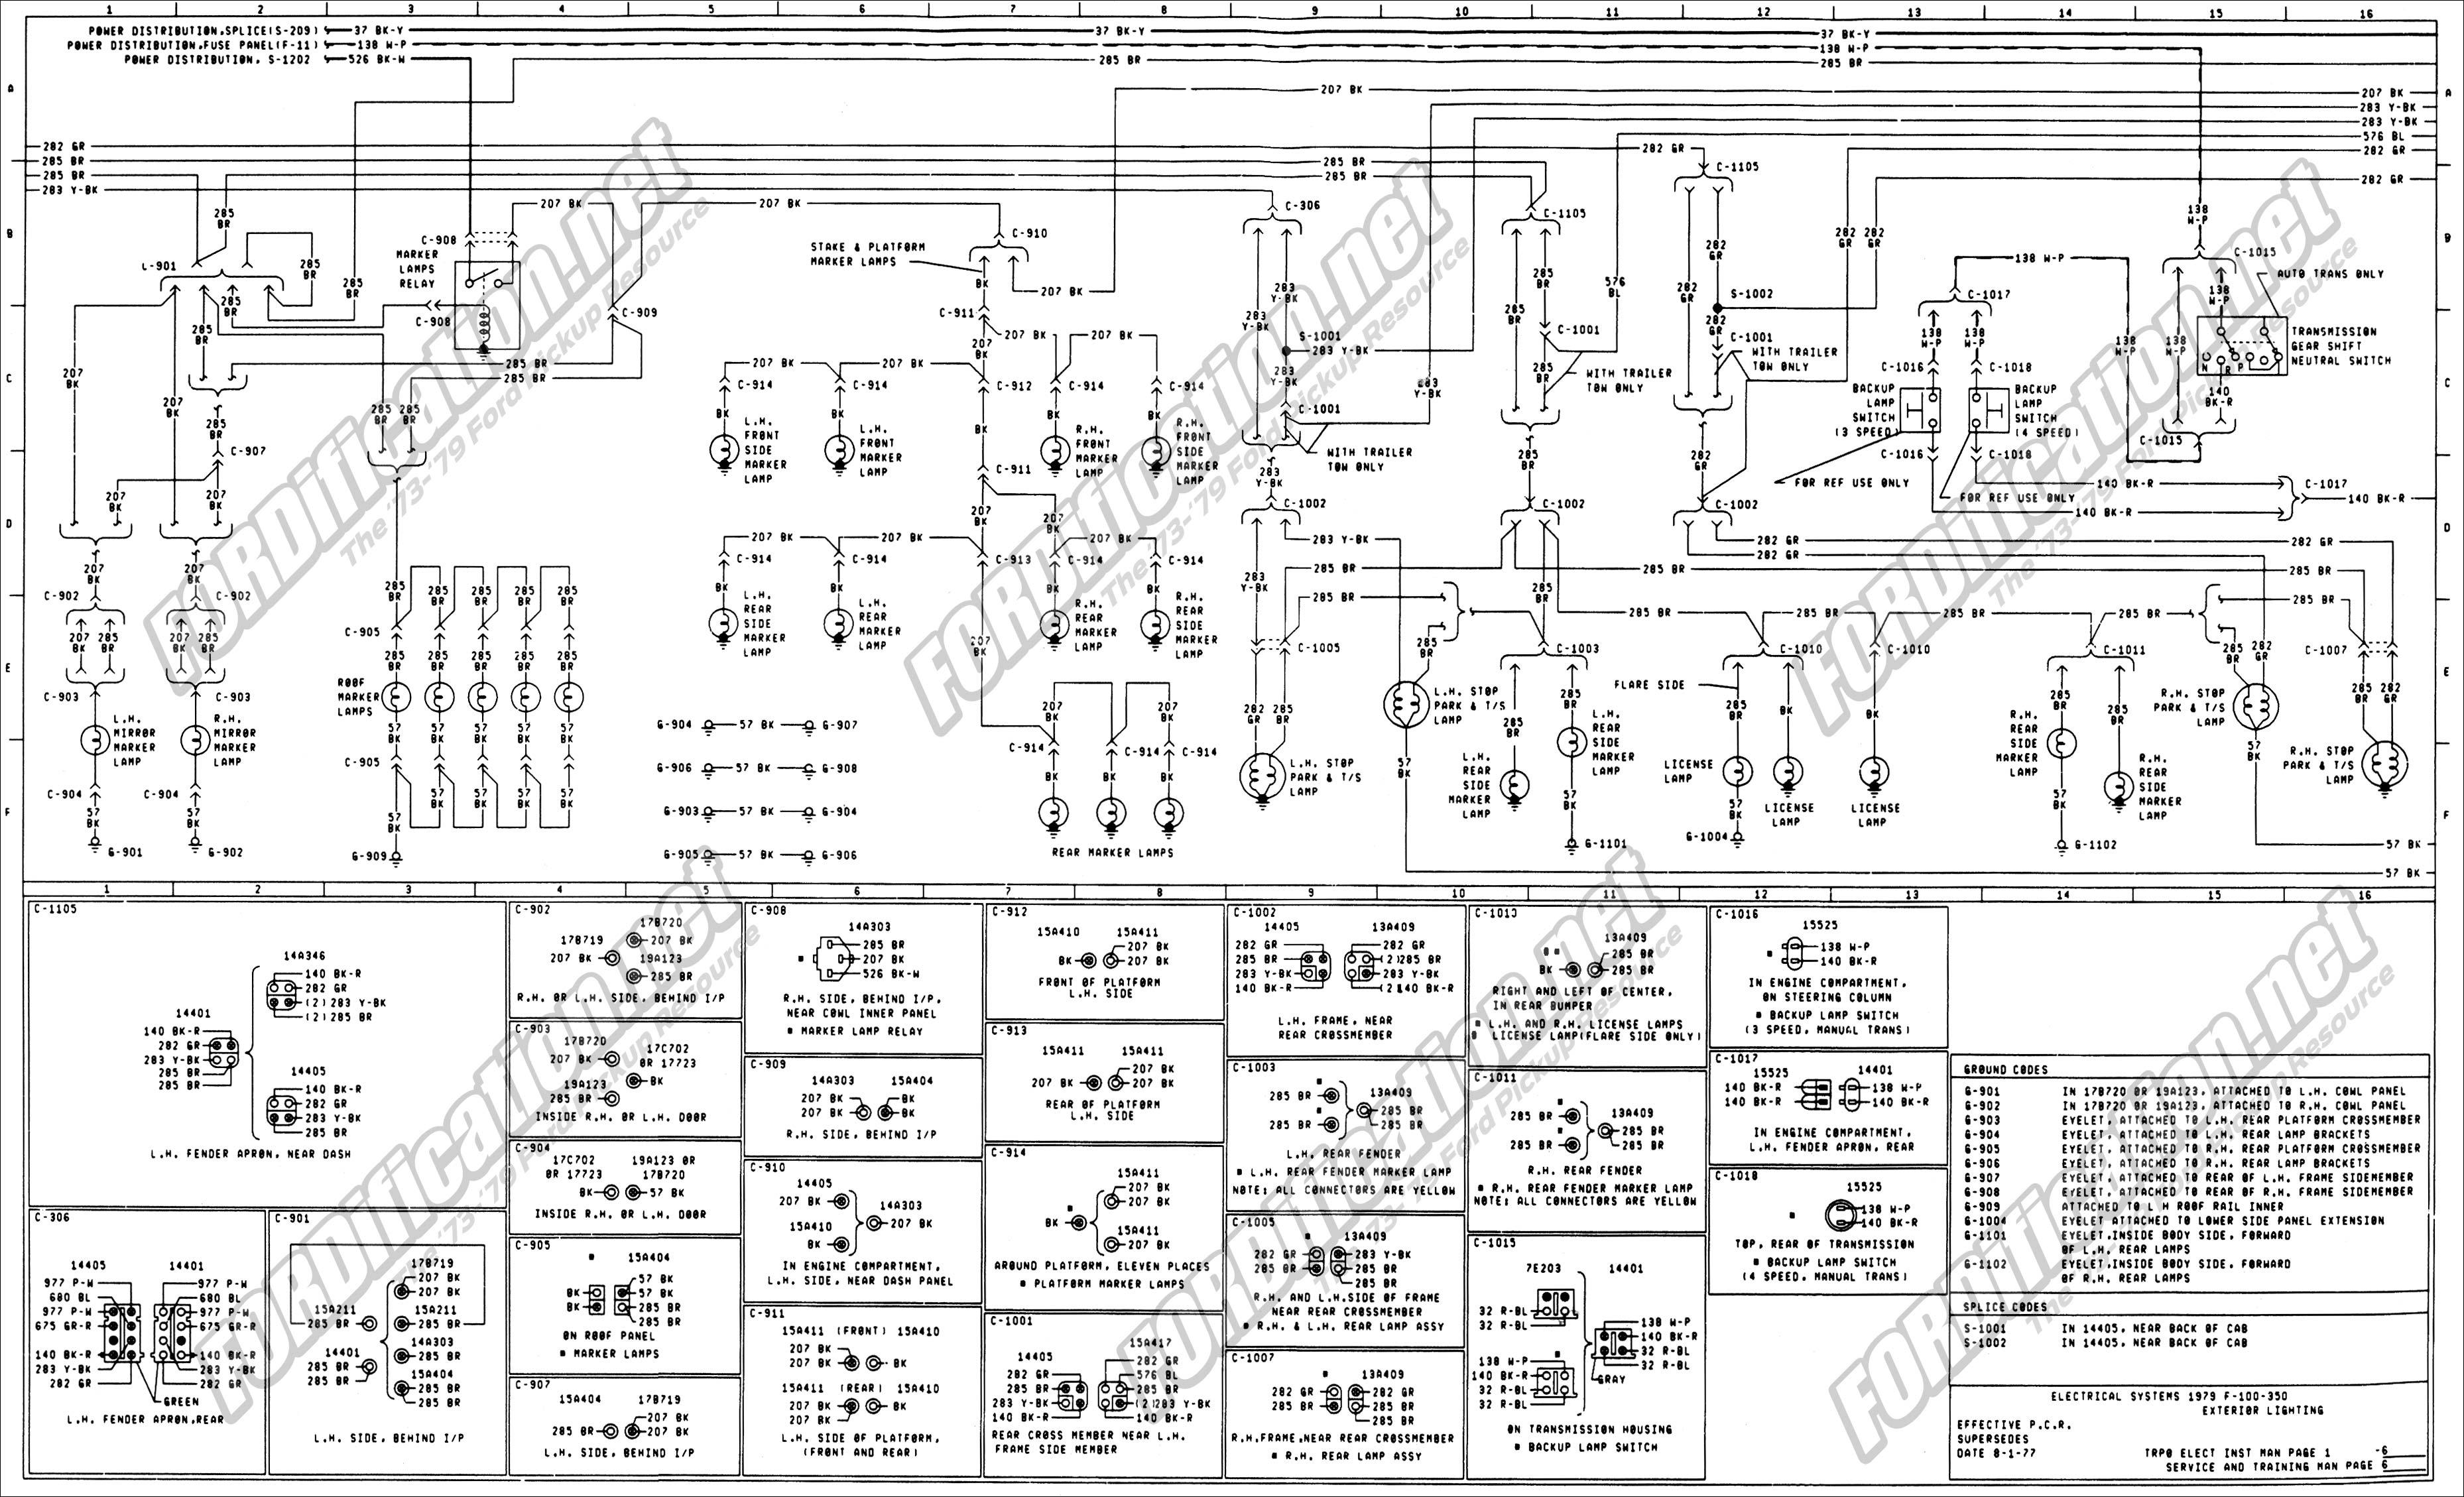 Strange 1989 Ford F250 Wiring Diagram Basic Electronics Wiring Diagram Wiring Cloud Waroletkolfr09Org